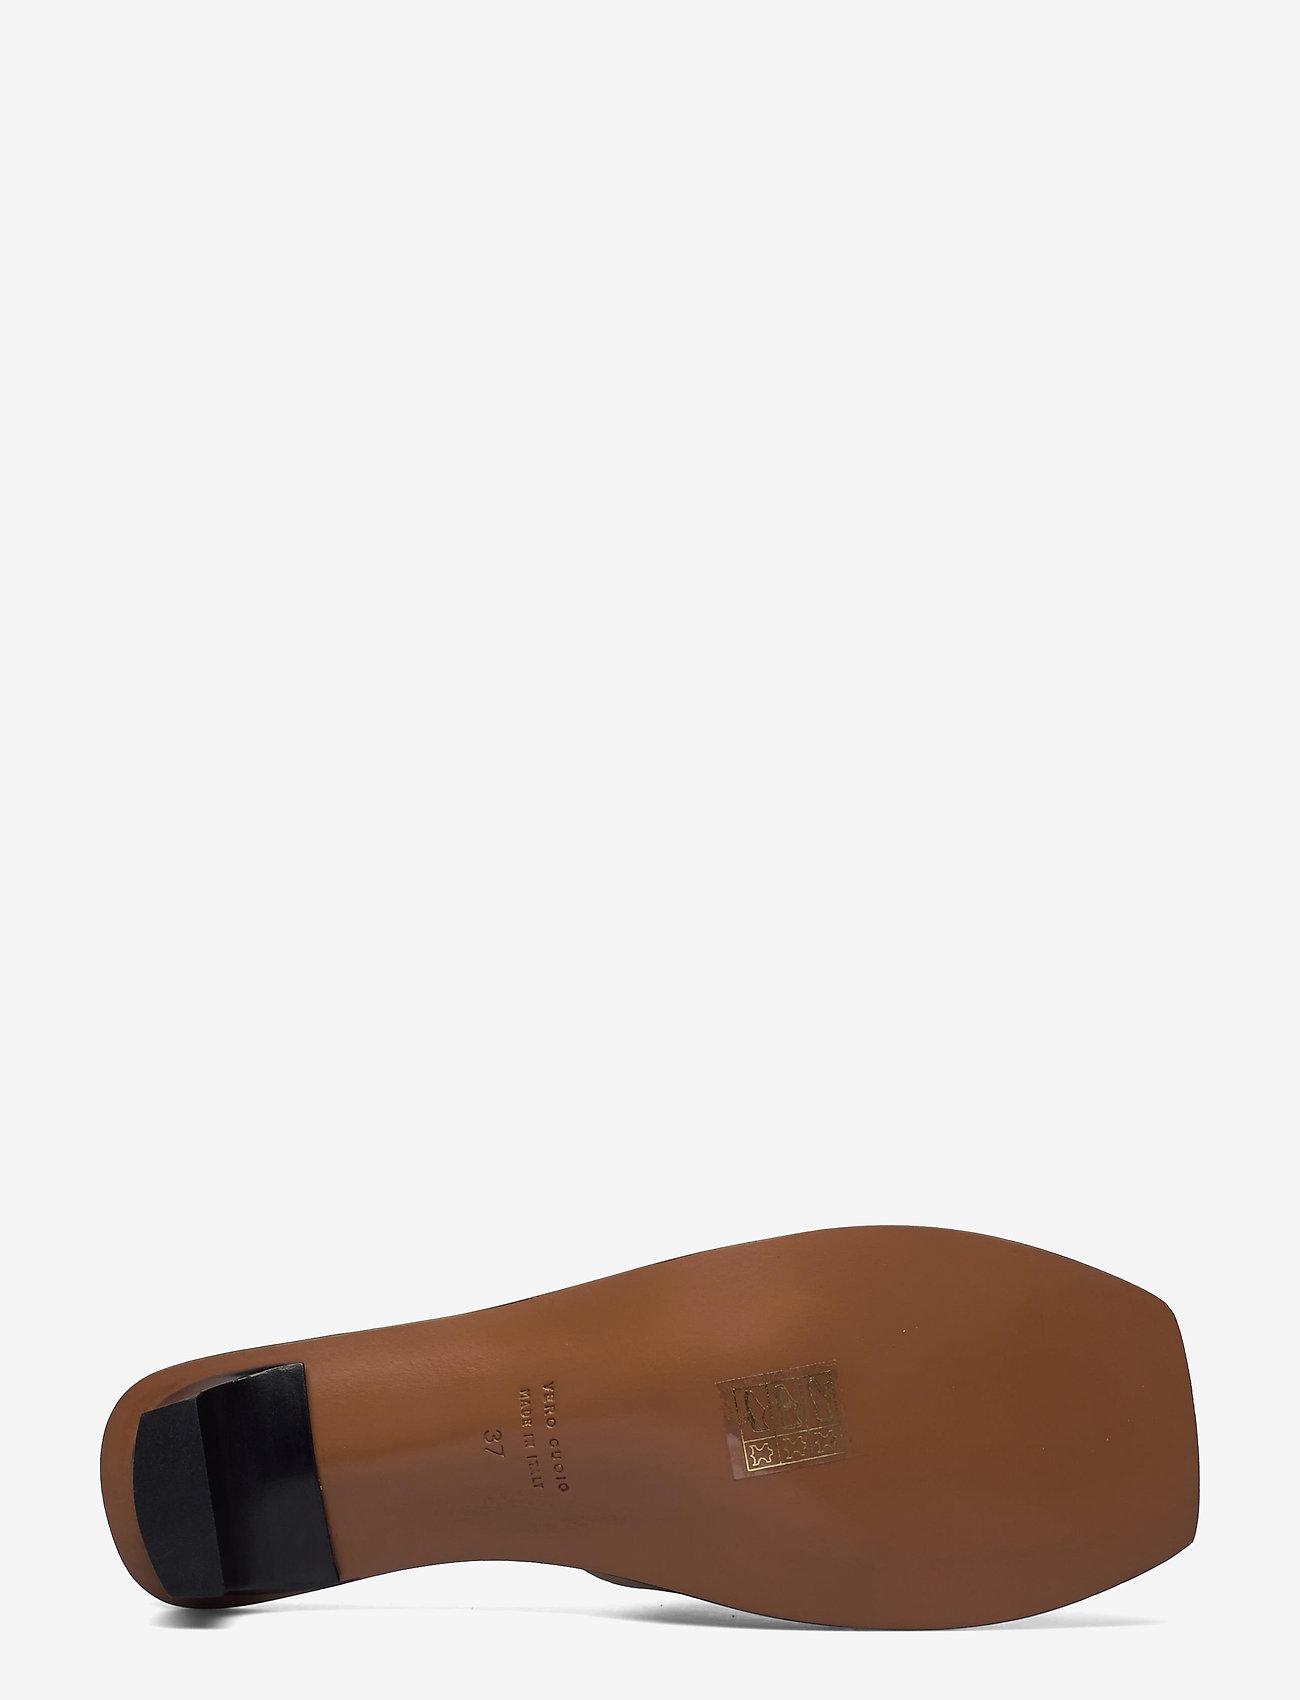 ATP Atelier - Stornarella Sand Vacchetta - heeled sandals - sand - 4